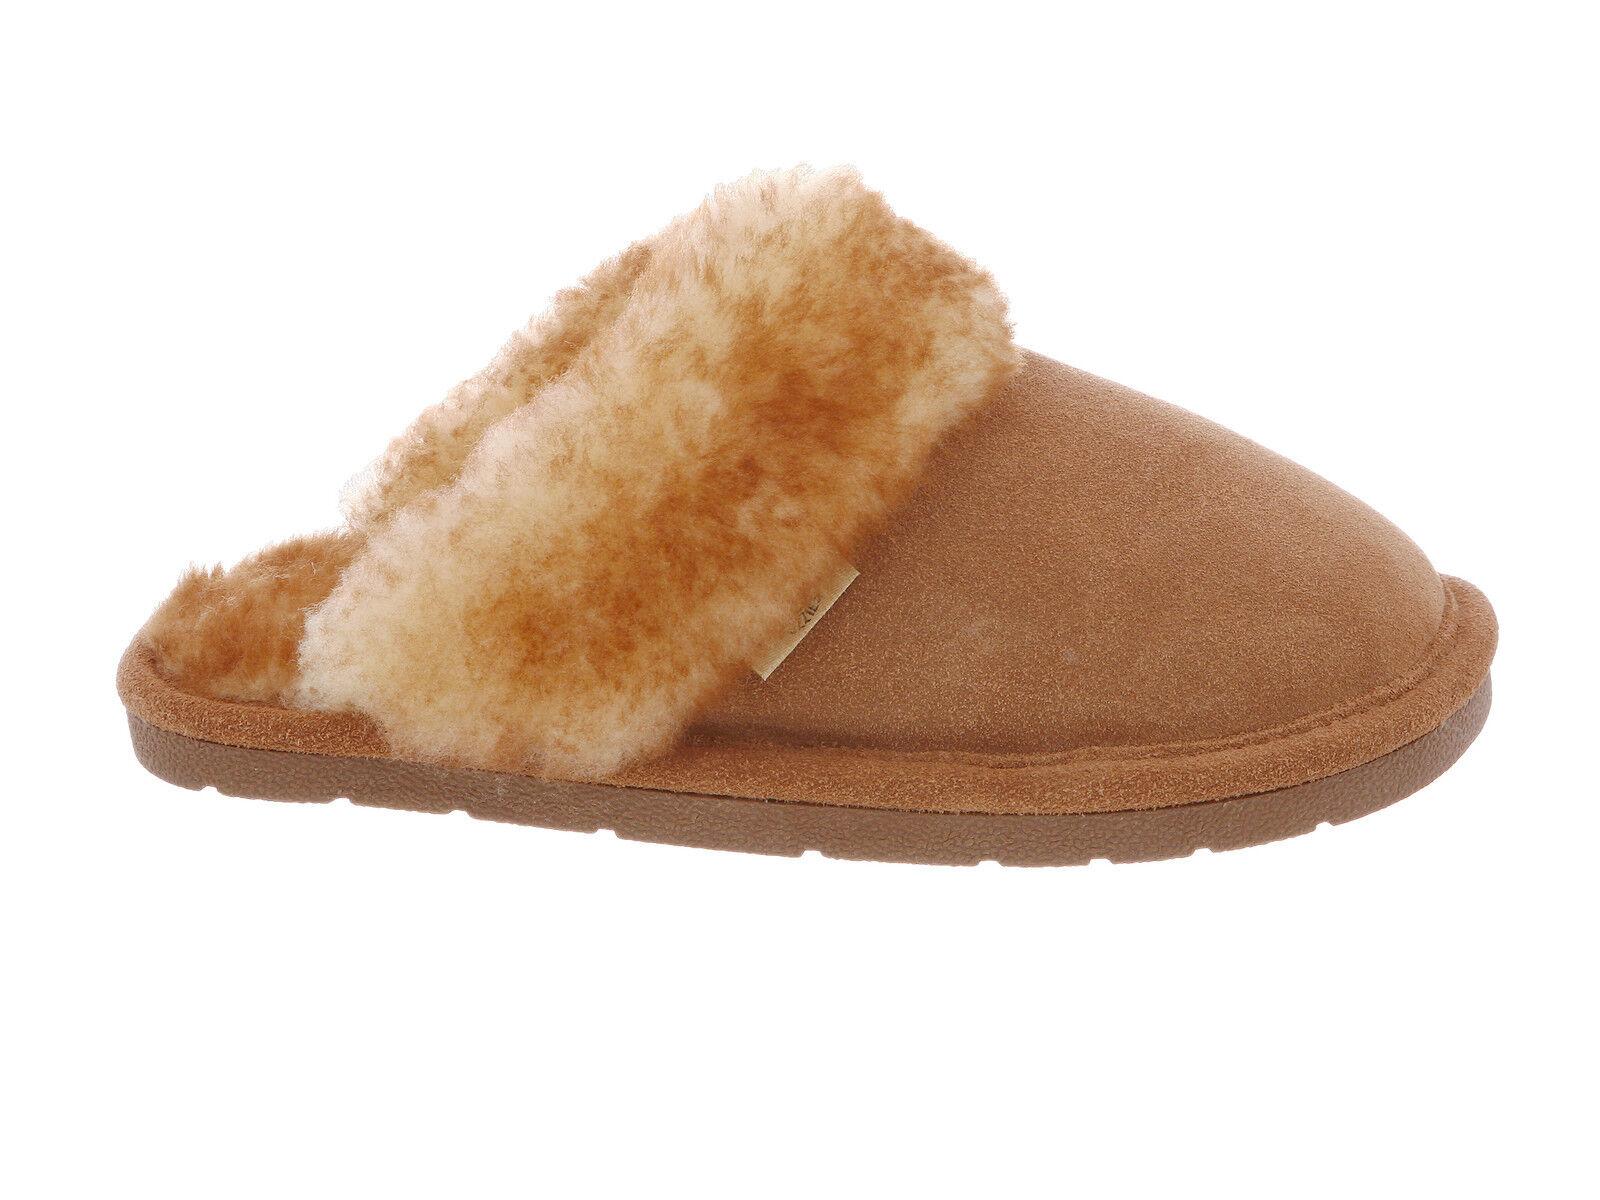 Rj's Cloud Nine Genuine Sheepskin Ladies Scuff Slippers Chestnut Medium (M, B)